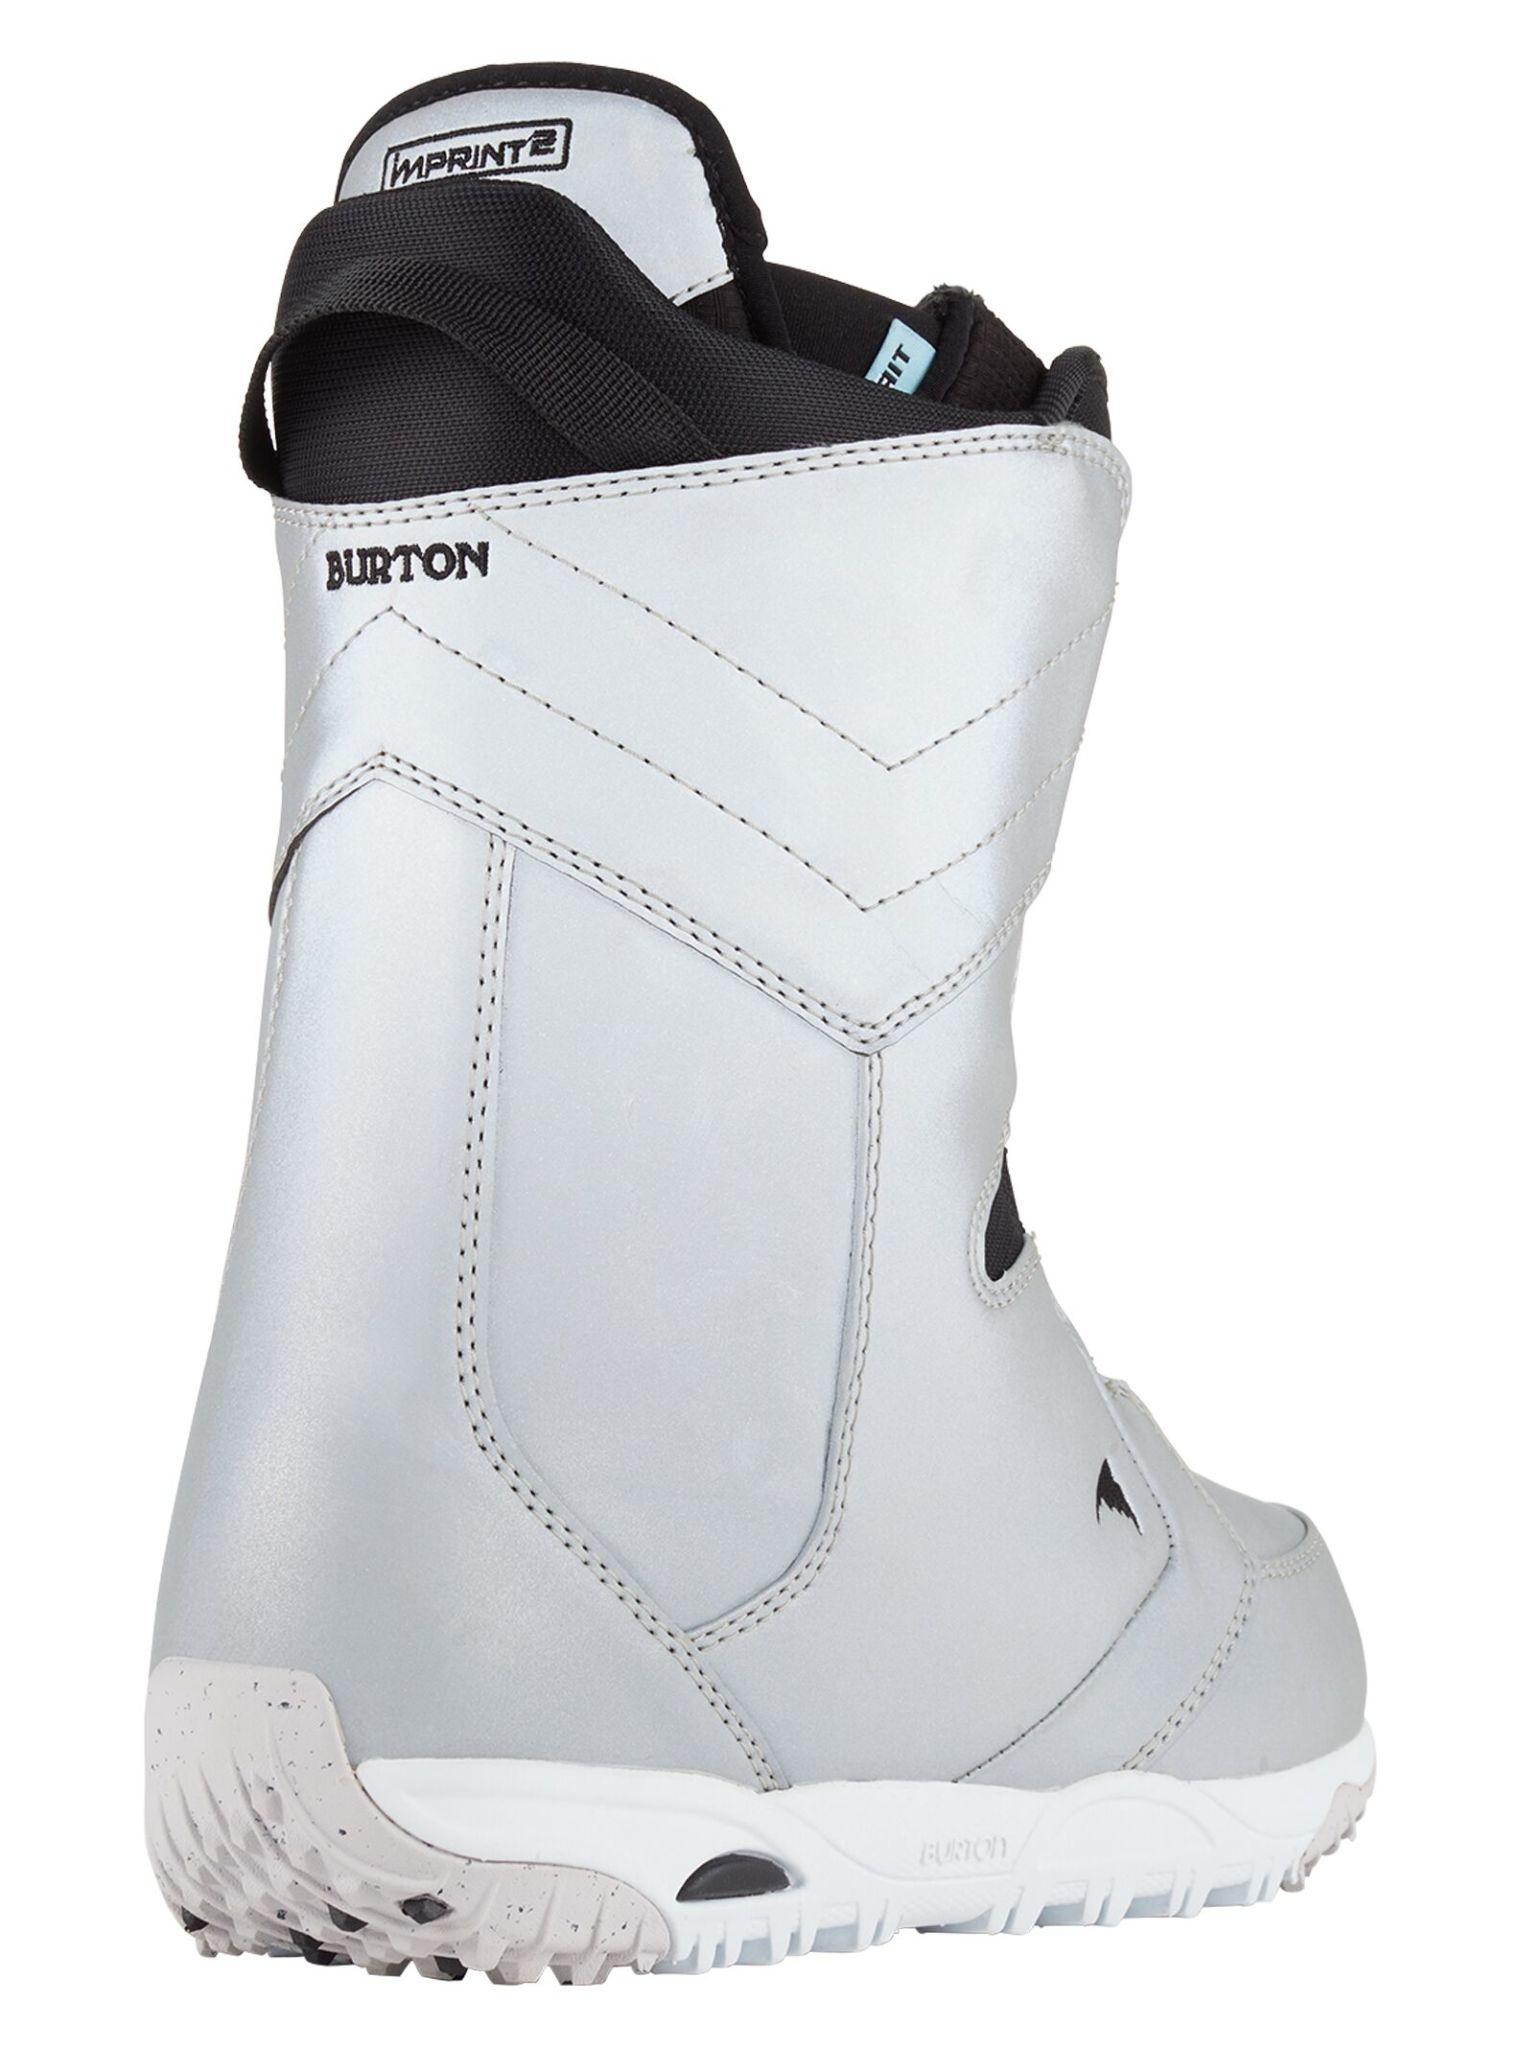 Burton Burton Women's Limelight Boa Snowboard Boot (2021)